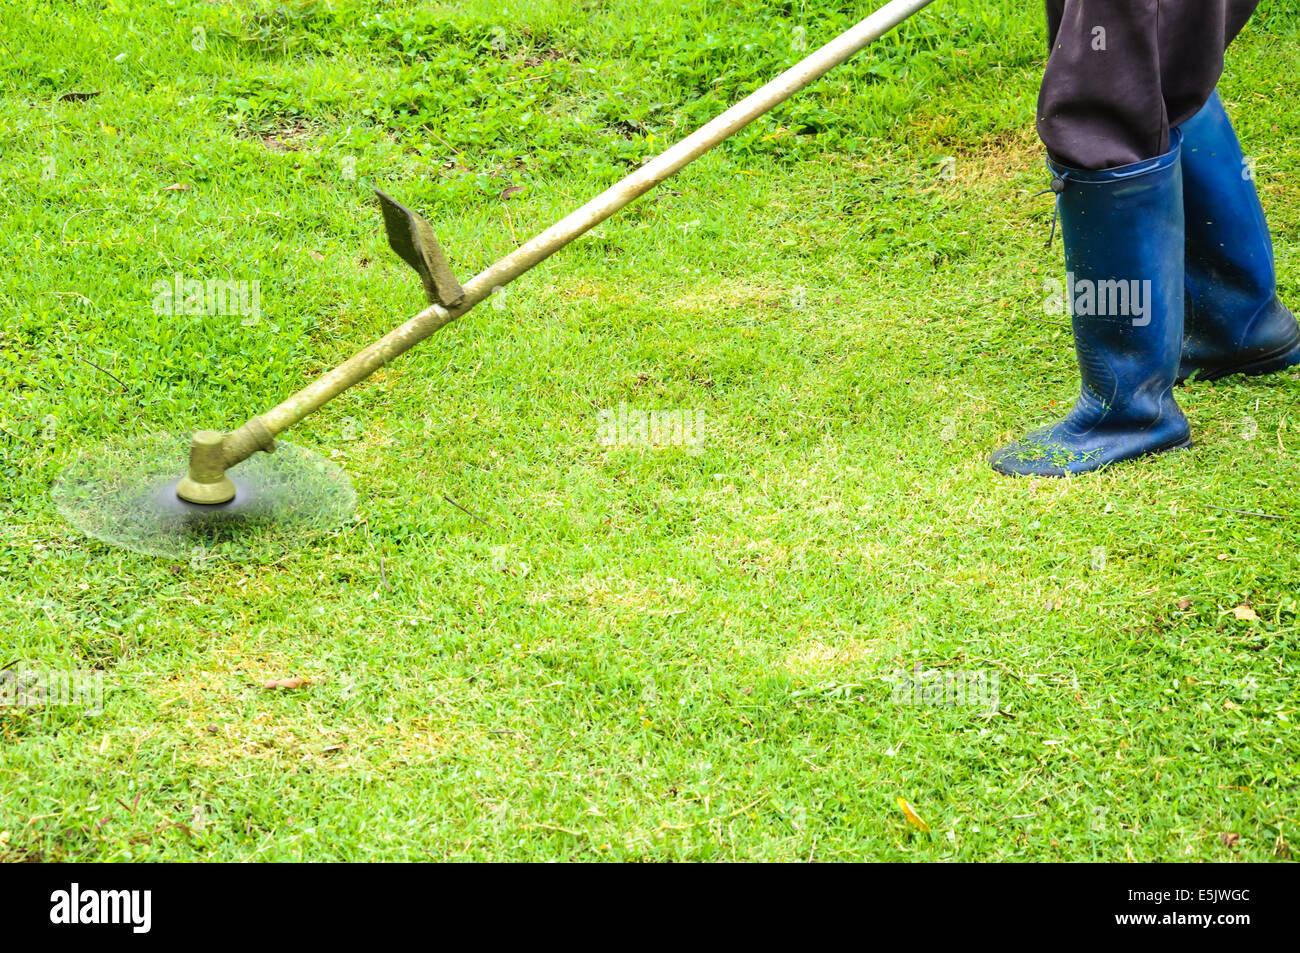 Rasenmahen Mit Mahen Maschine Arbeiter Stockfoto Bild 72329948 Alamy